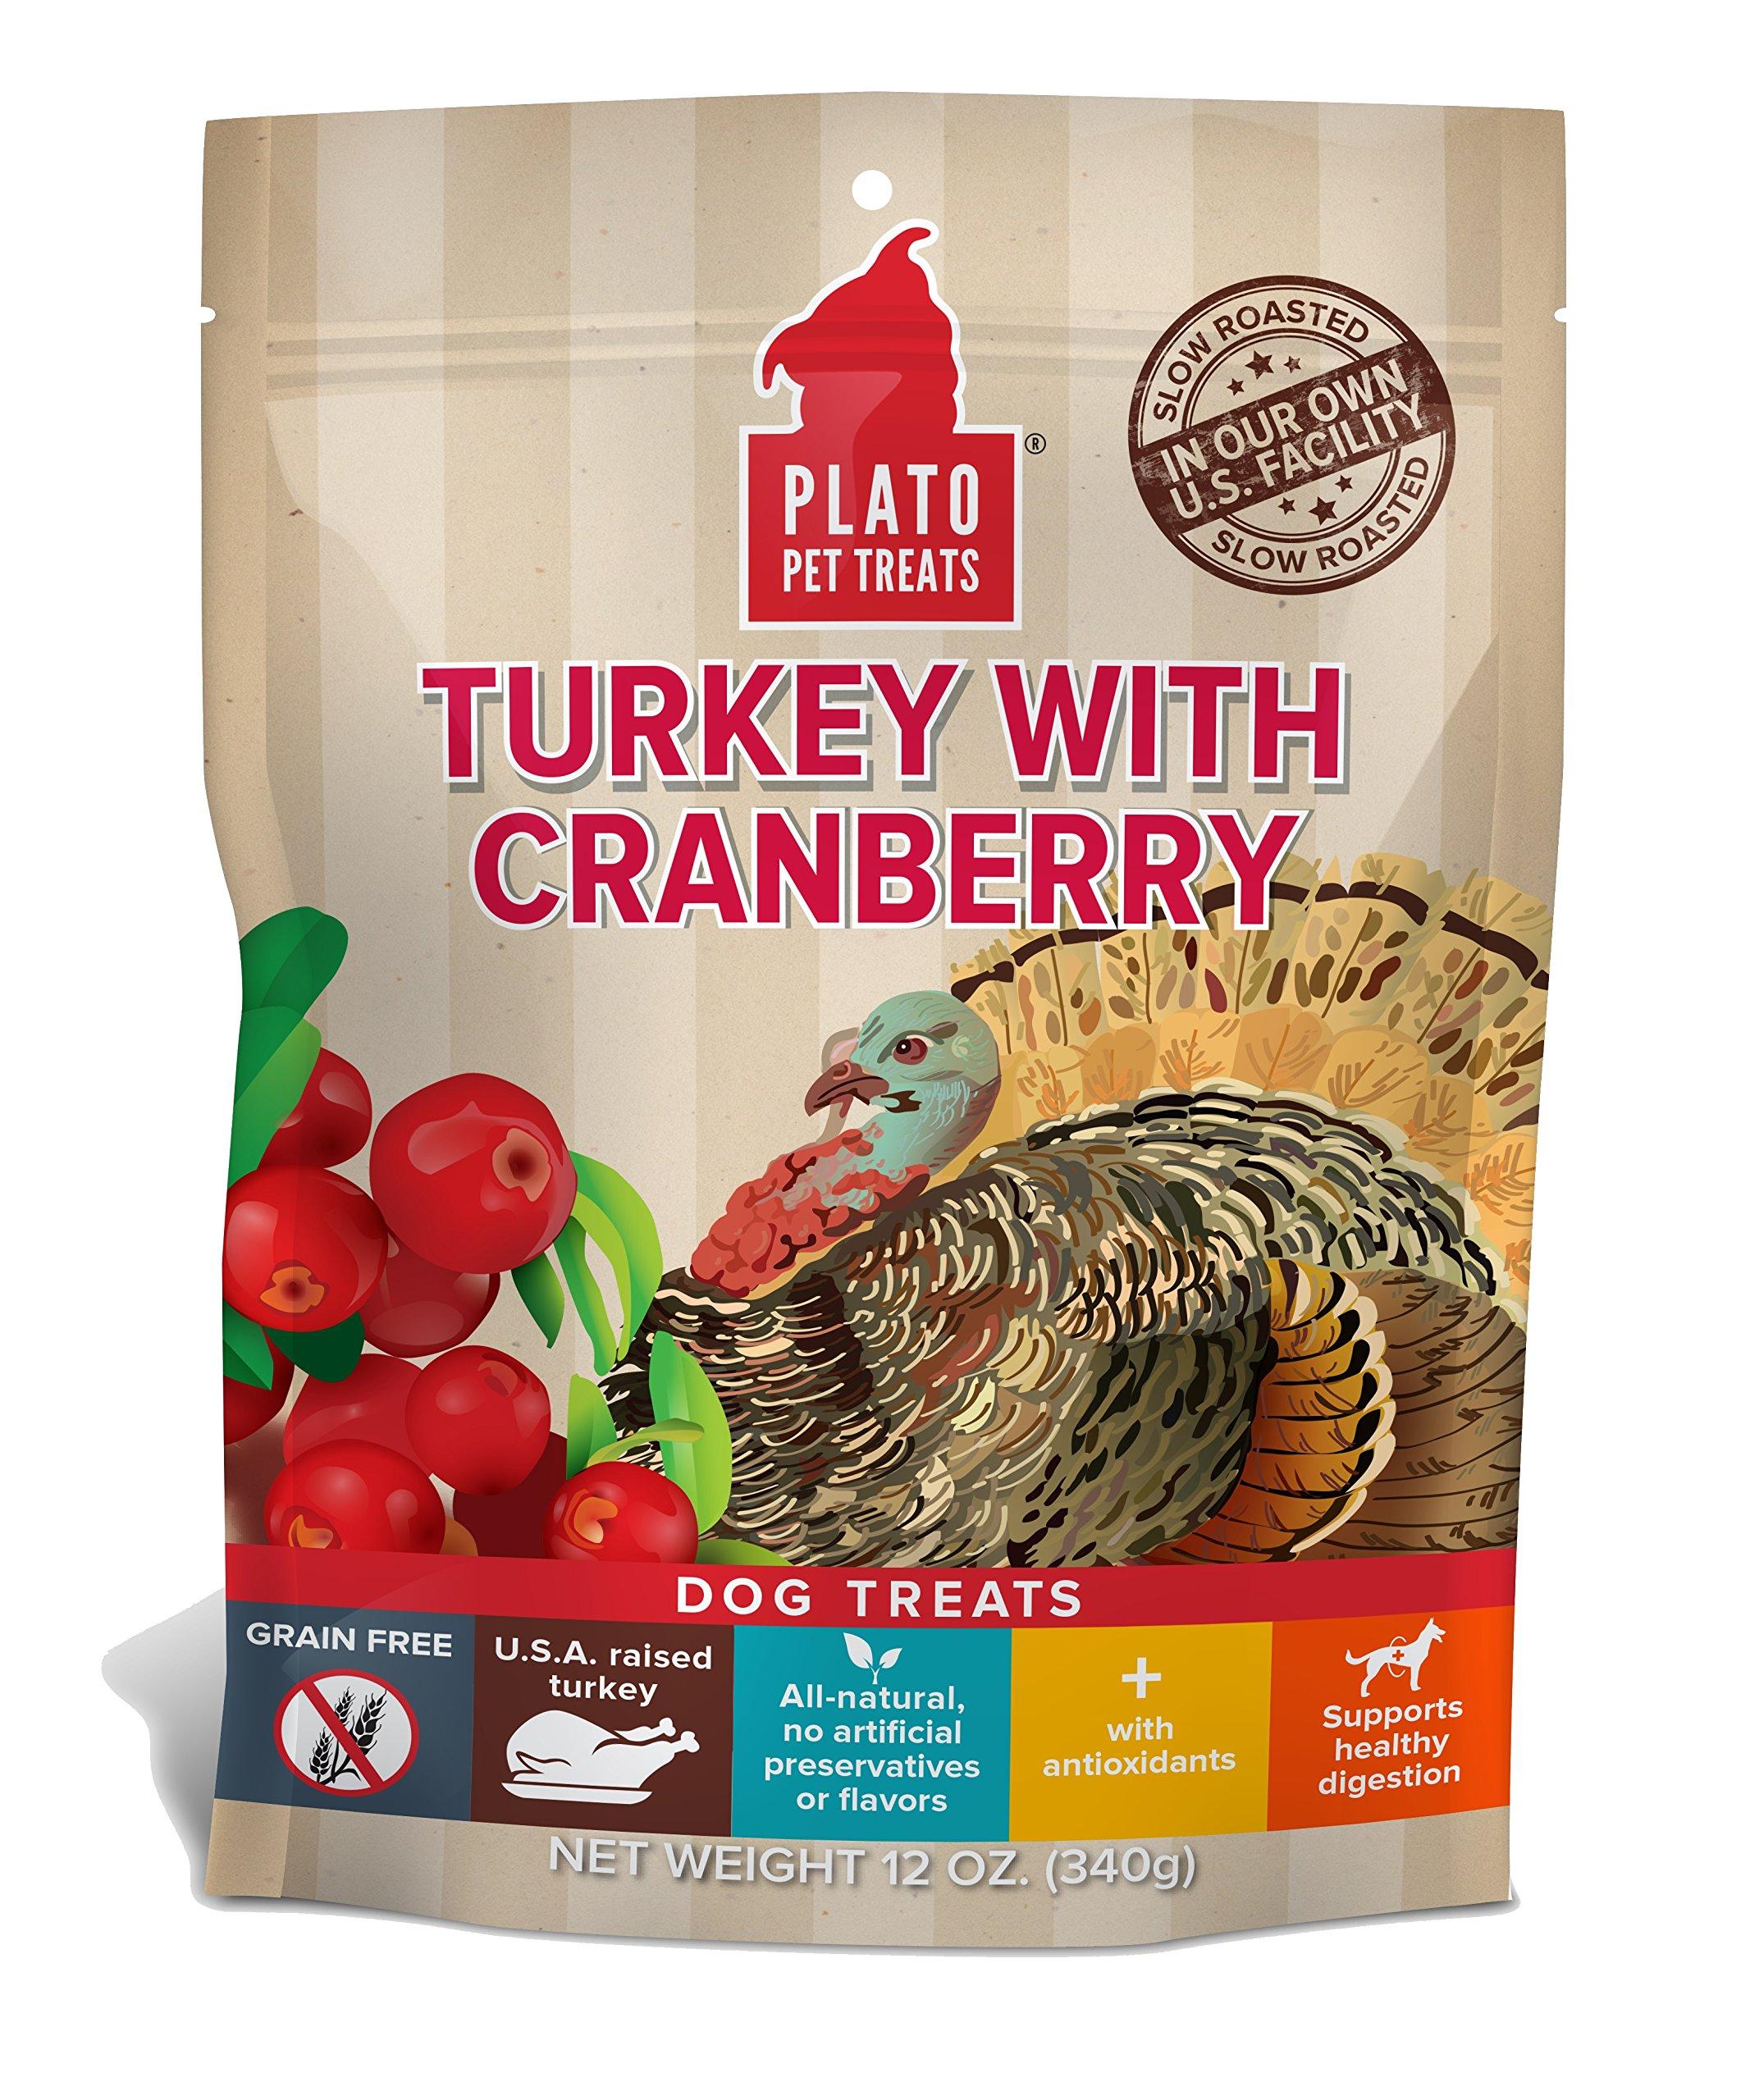 PLATO PET TREATS 595163 Eos Turkey/Cranberry for Pets, 12-Ounce